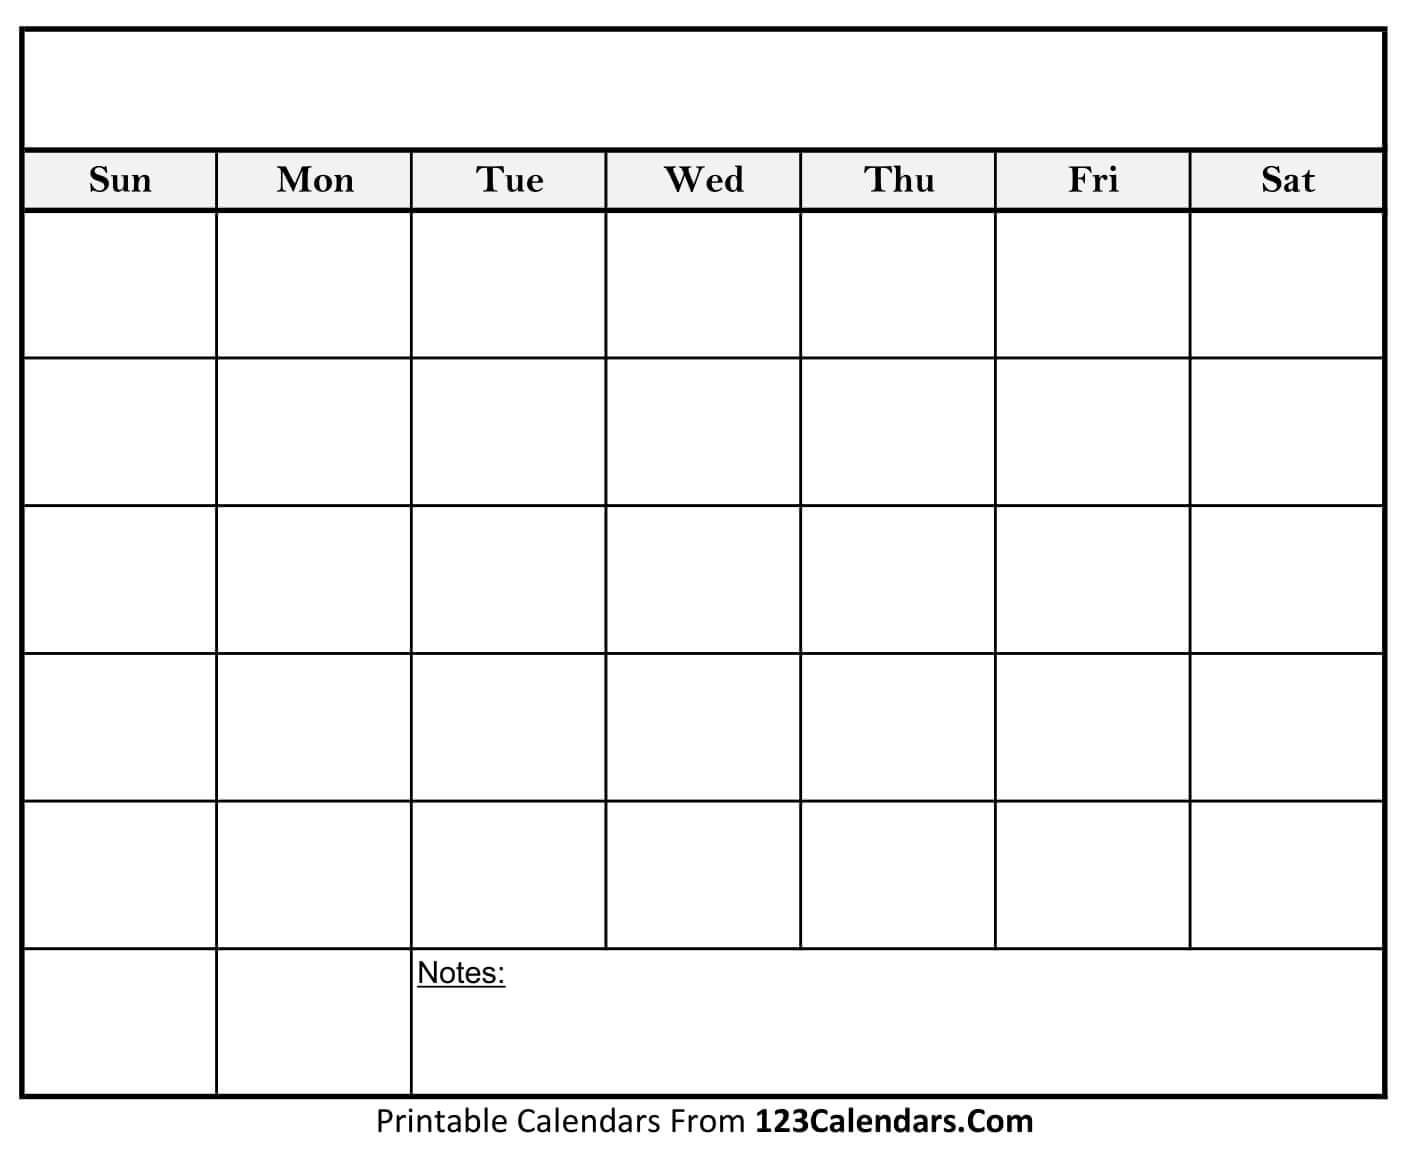 Free Printable Blank Calendar | 123Calendars pertaining to Empty Calendar Printable